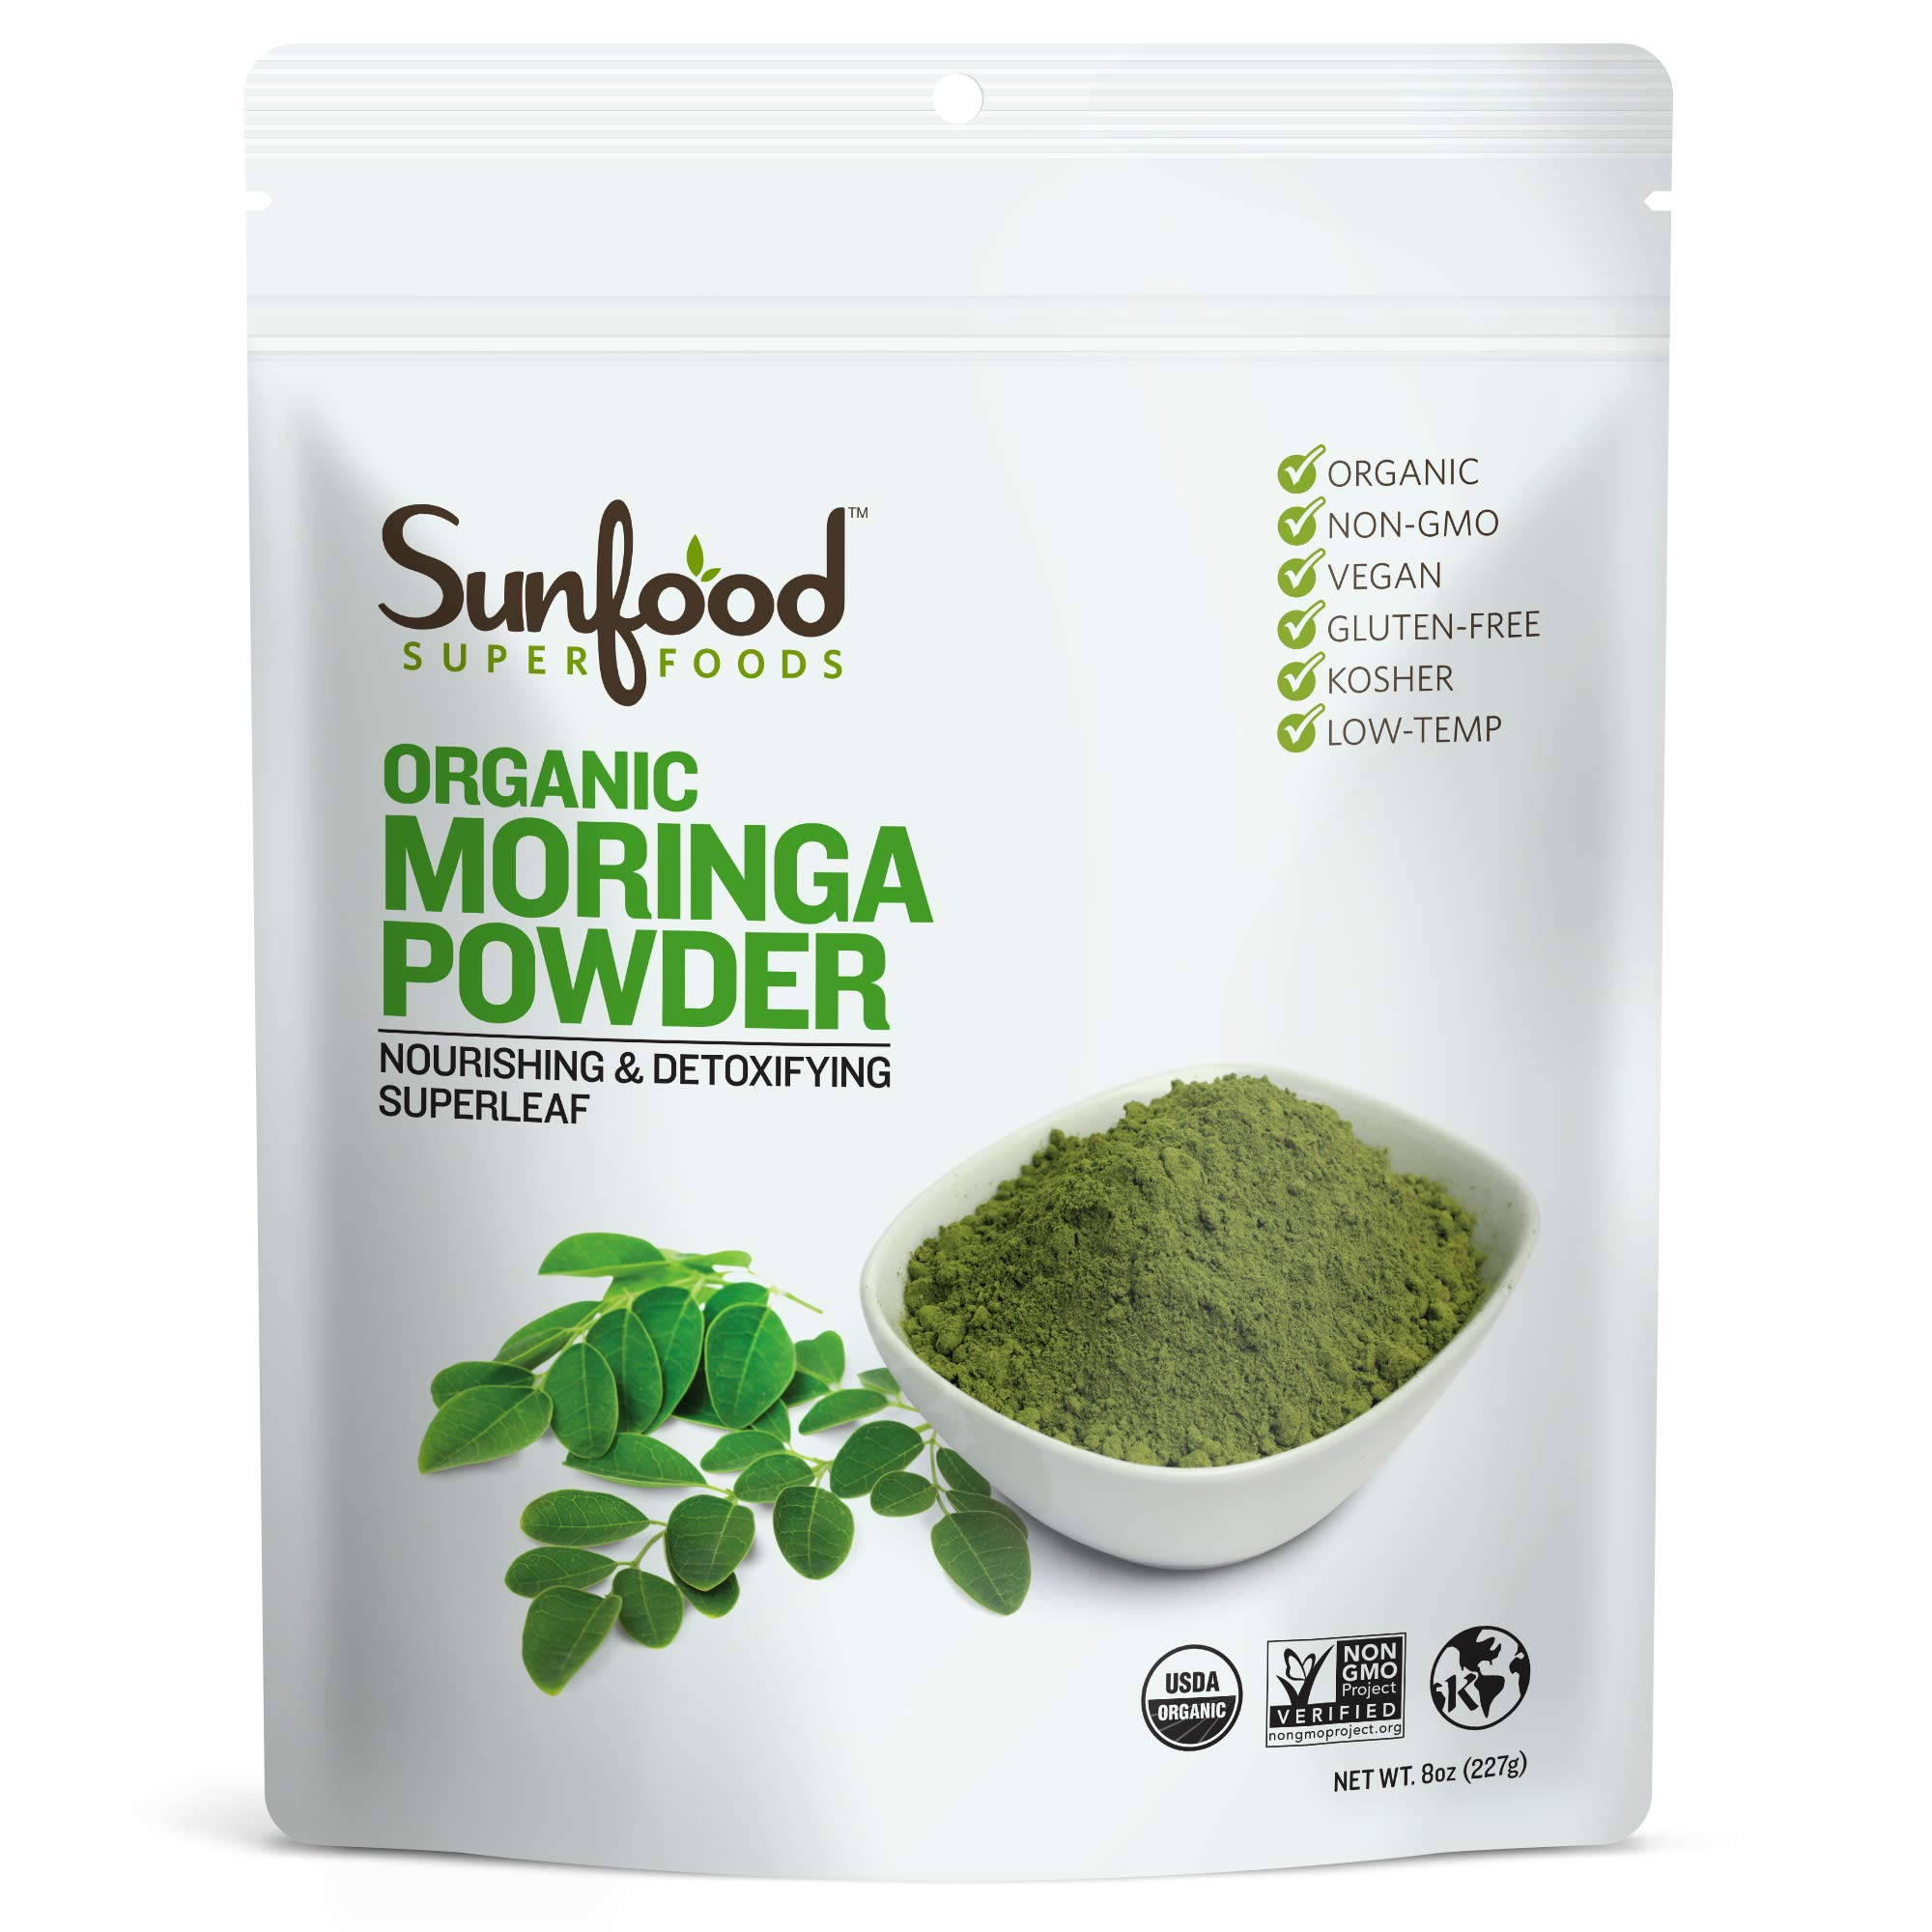 Sunfood Superfoods Moringa Powder. Whole Food Nutrient Dense Super-Leaf. Organic, Non-GMO, Gluten-Free. 8 oz Bag